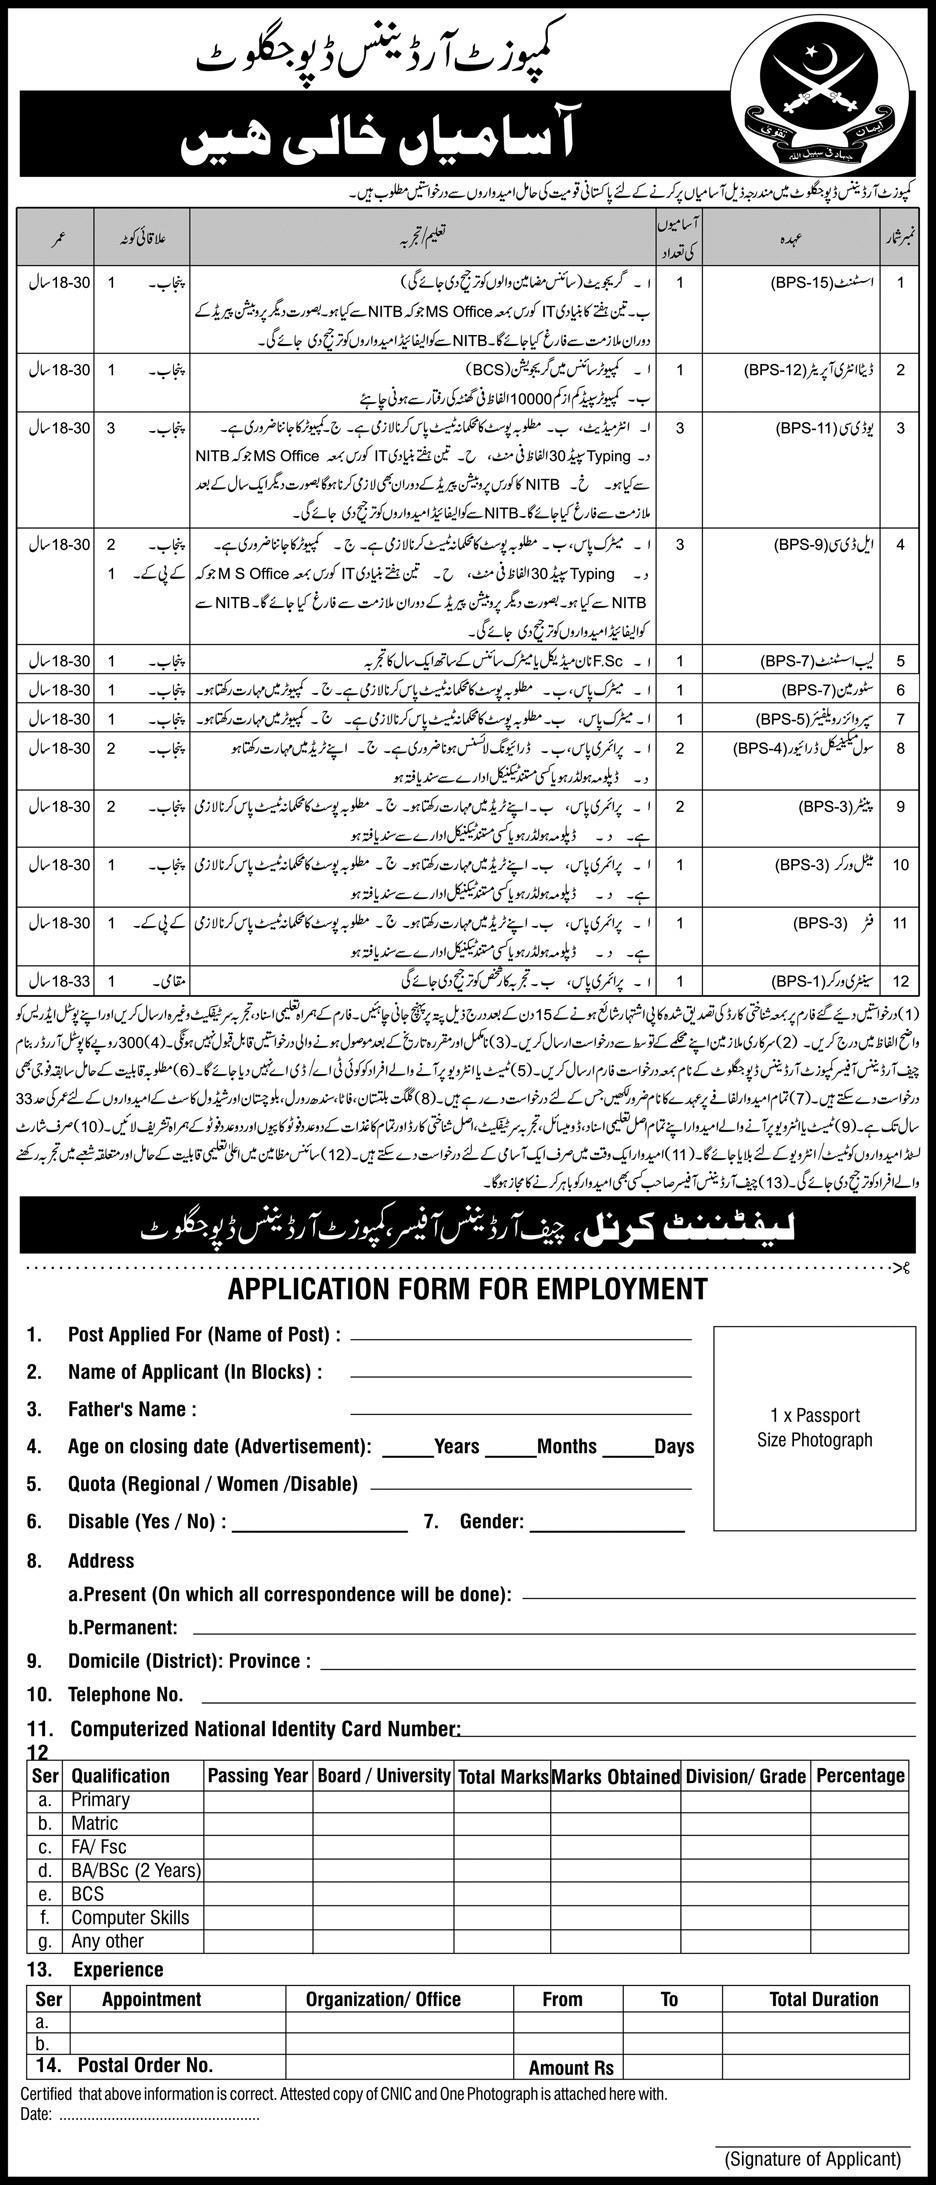 Composite Ordinance Depot Jagoot Pak Army Latest Jobs 2018 in Punjab on May, 2018 | Pakistan Army